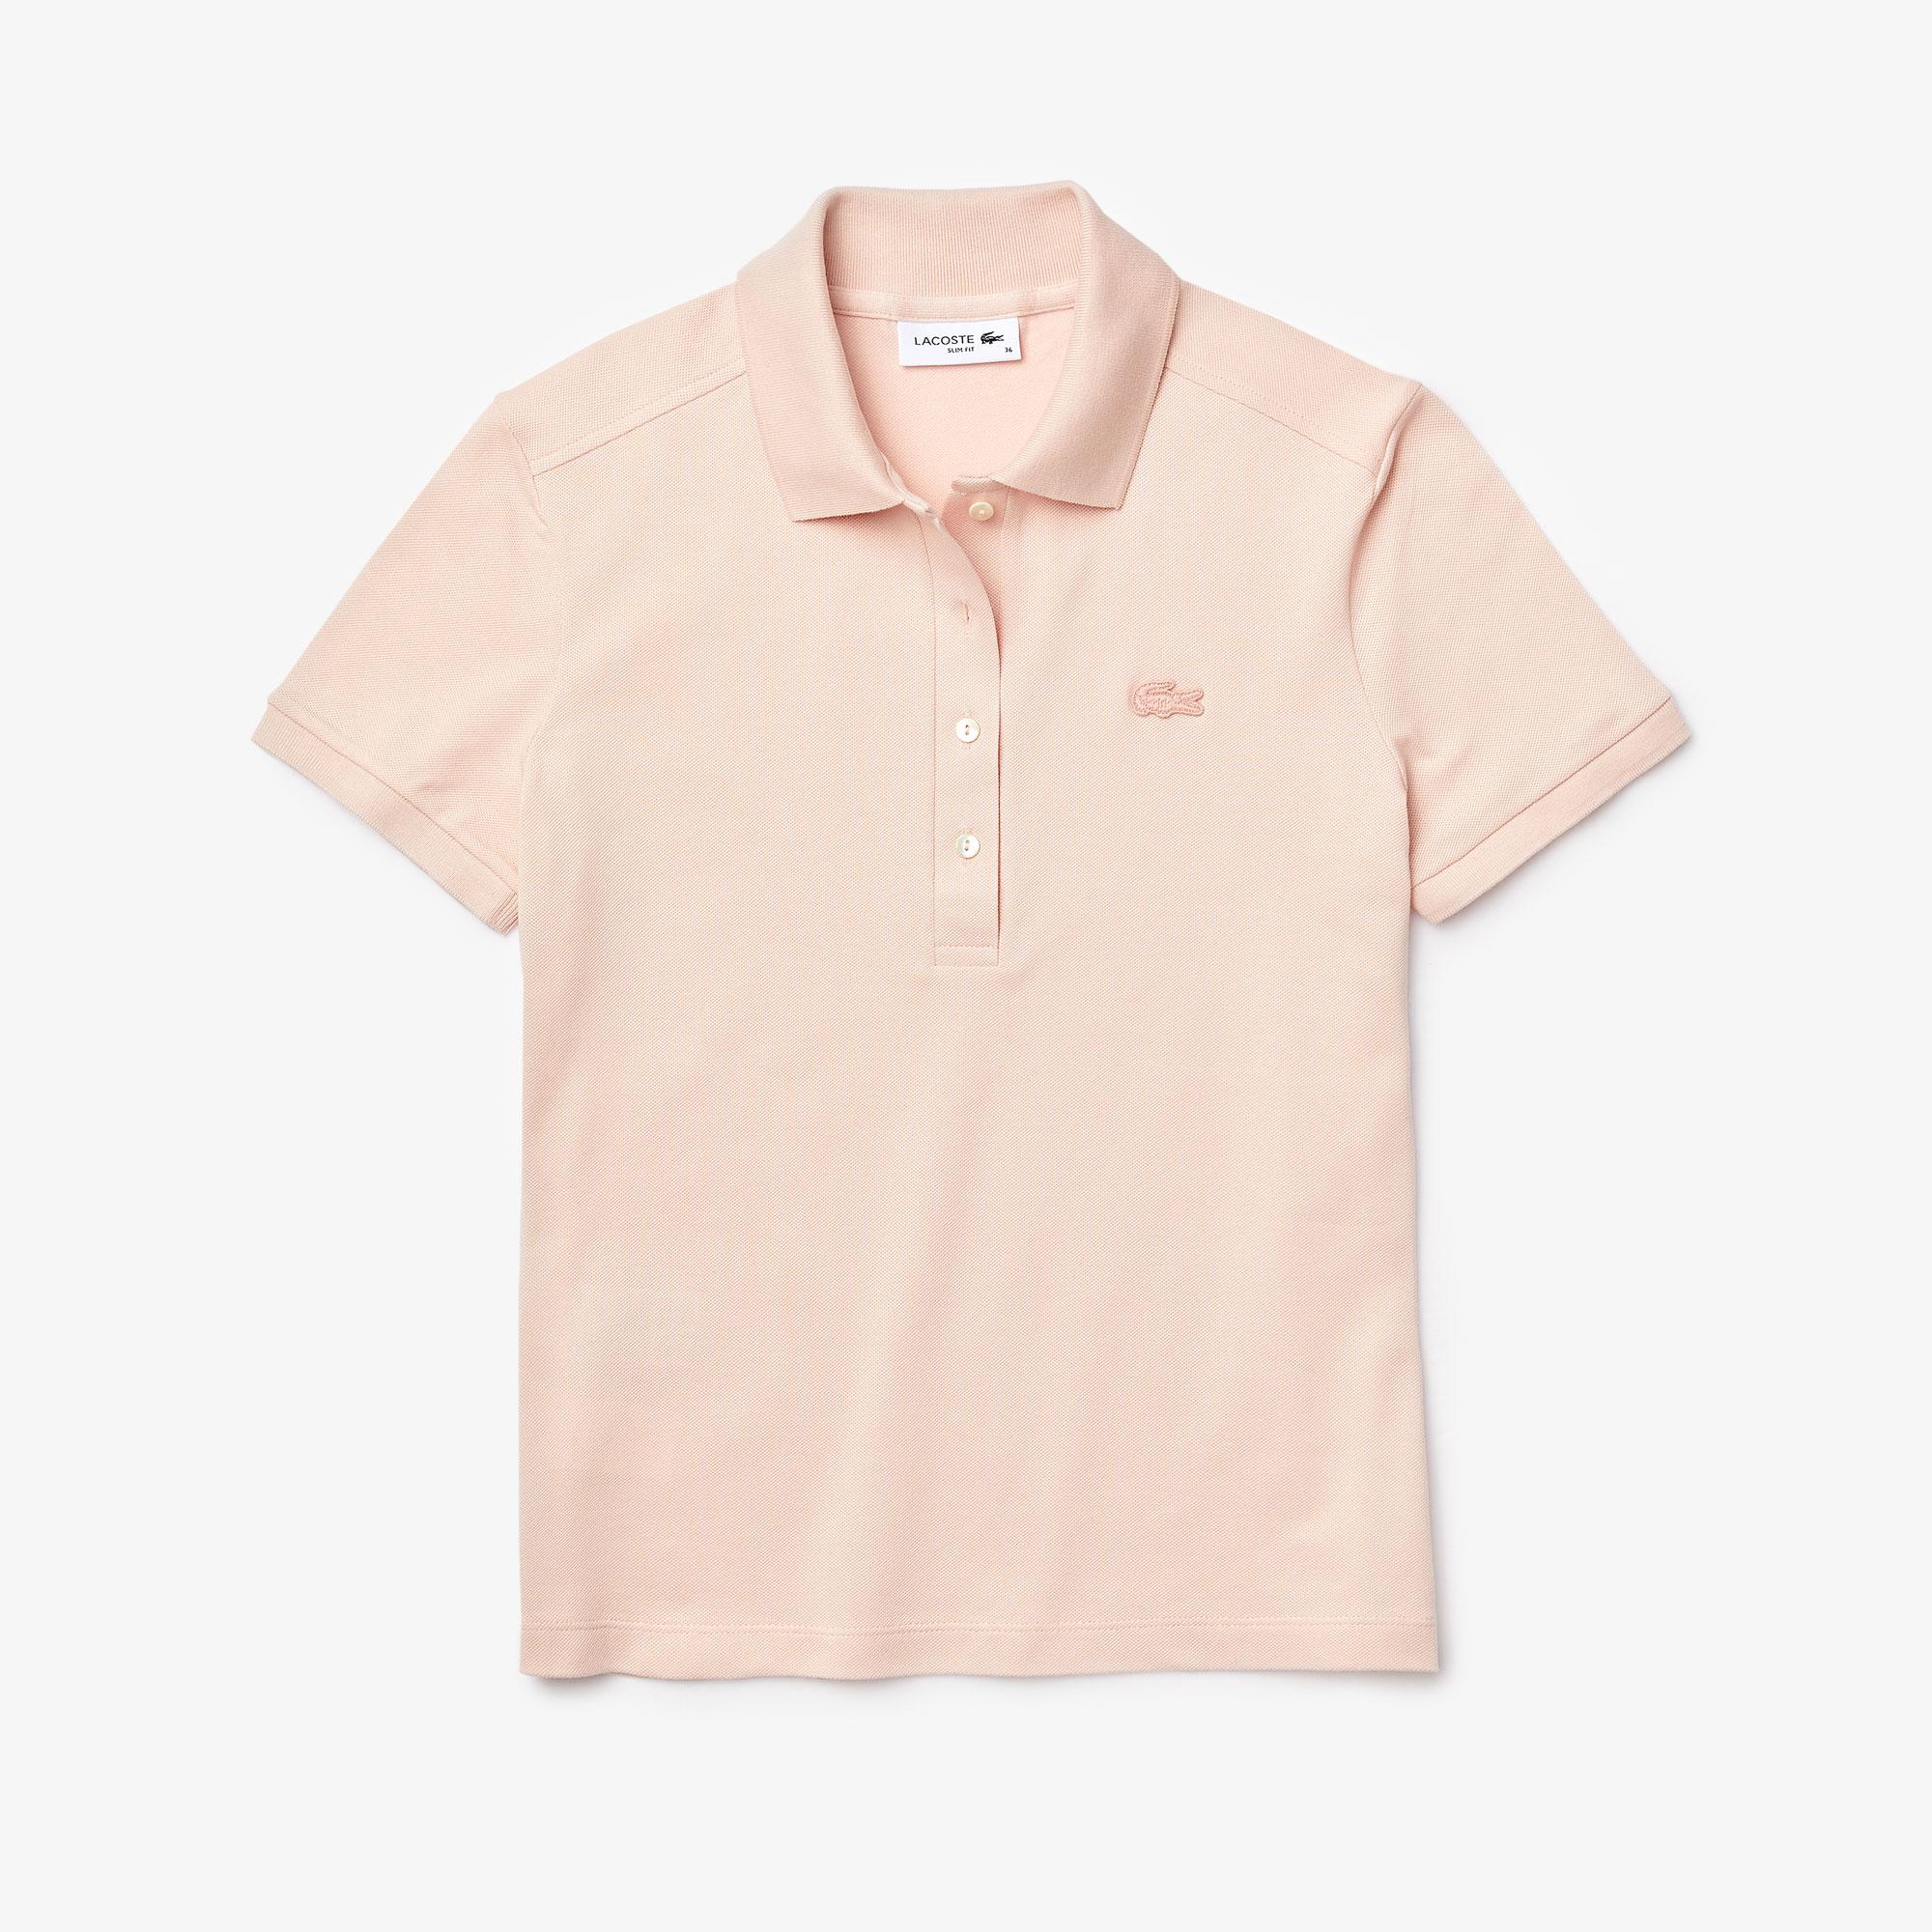 Lacoste Women's Stretch Cotton Piqué Polo